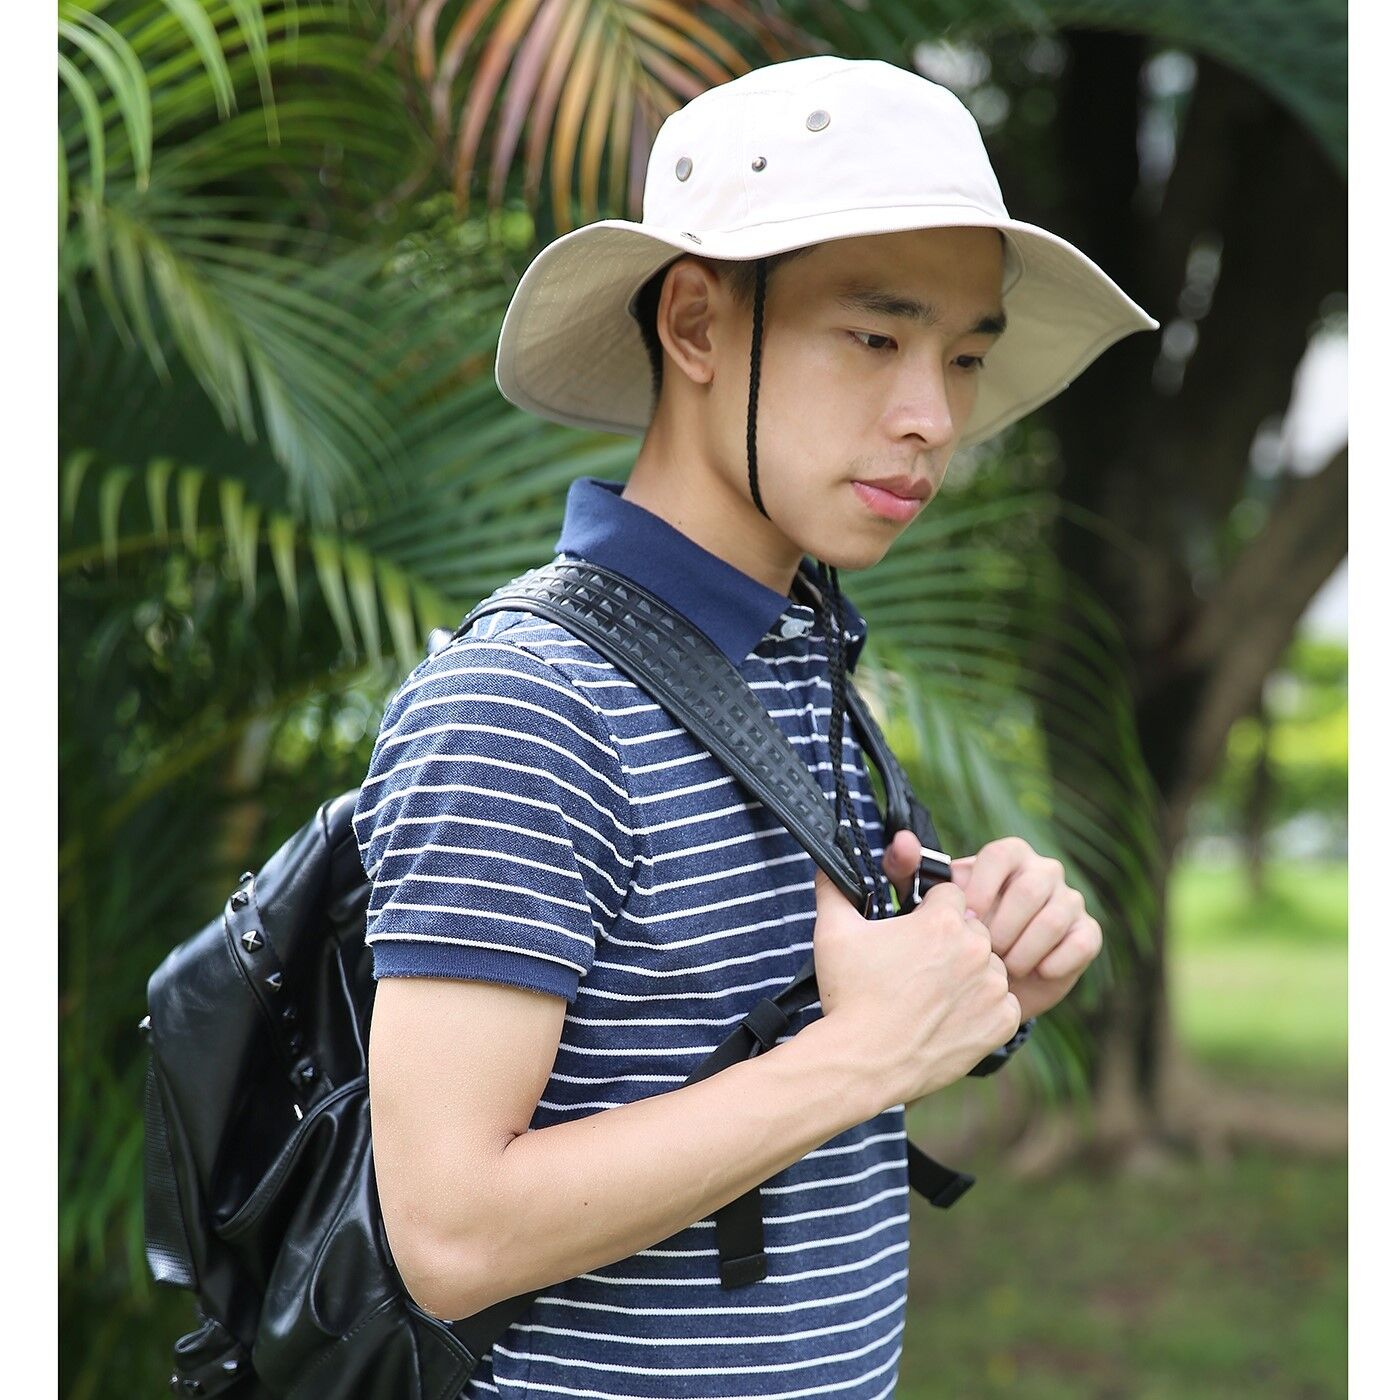 Men's Bucket Hat Side Snap Boonie Hat Outdoor UV Sun Protect